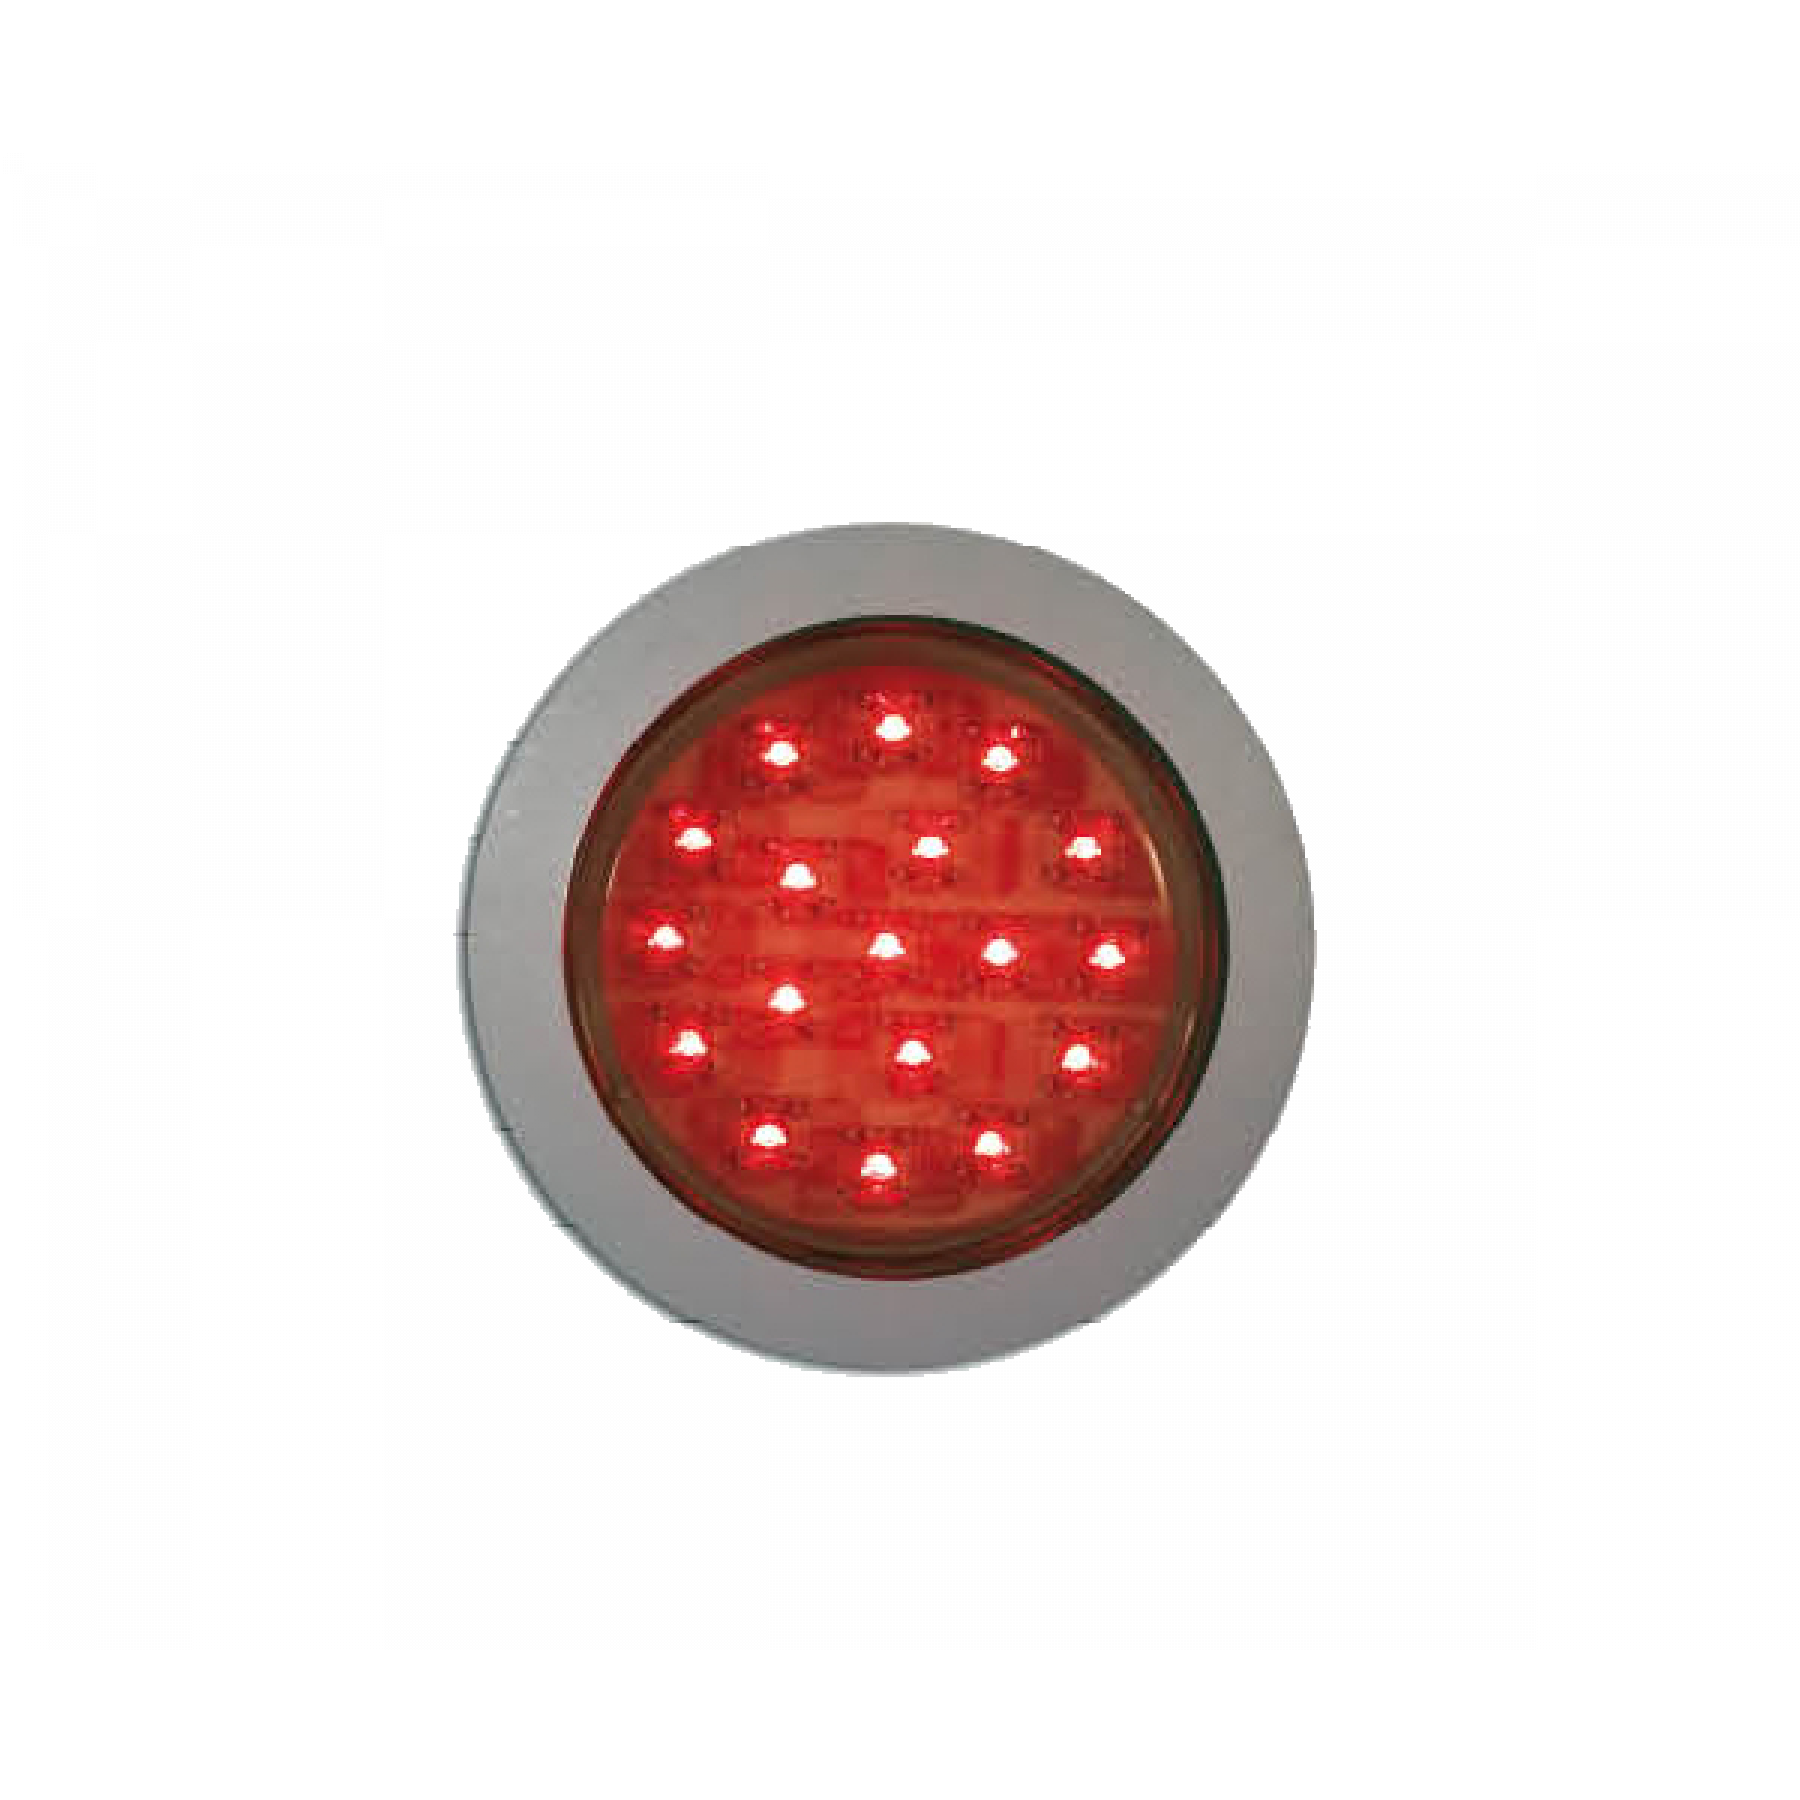 Interieurlamp LED rood Ø 55mm 24v